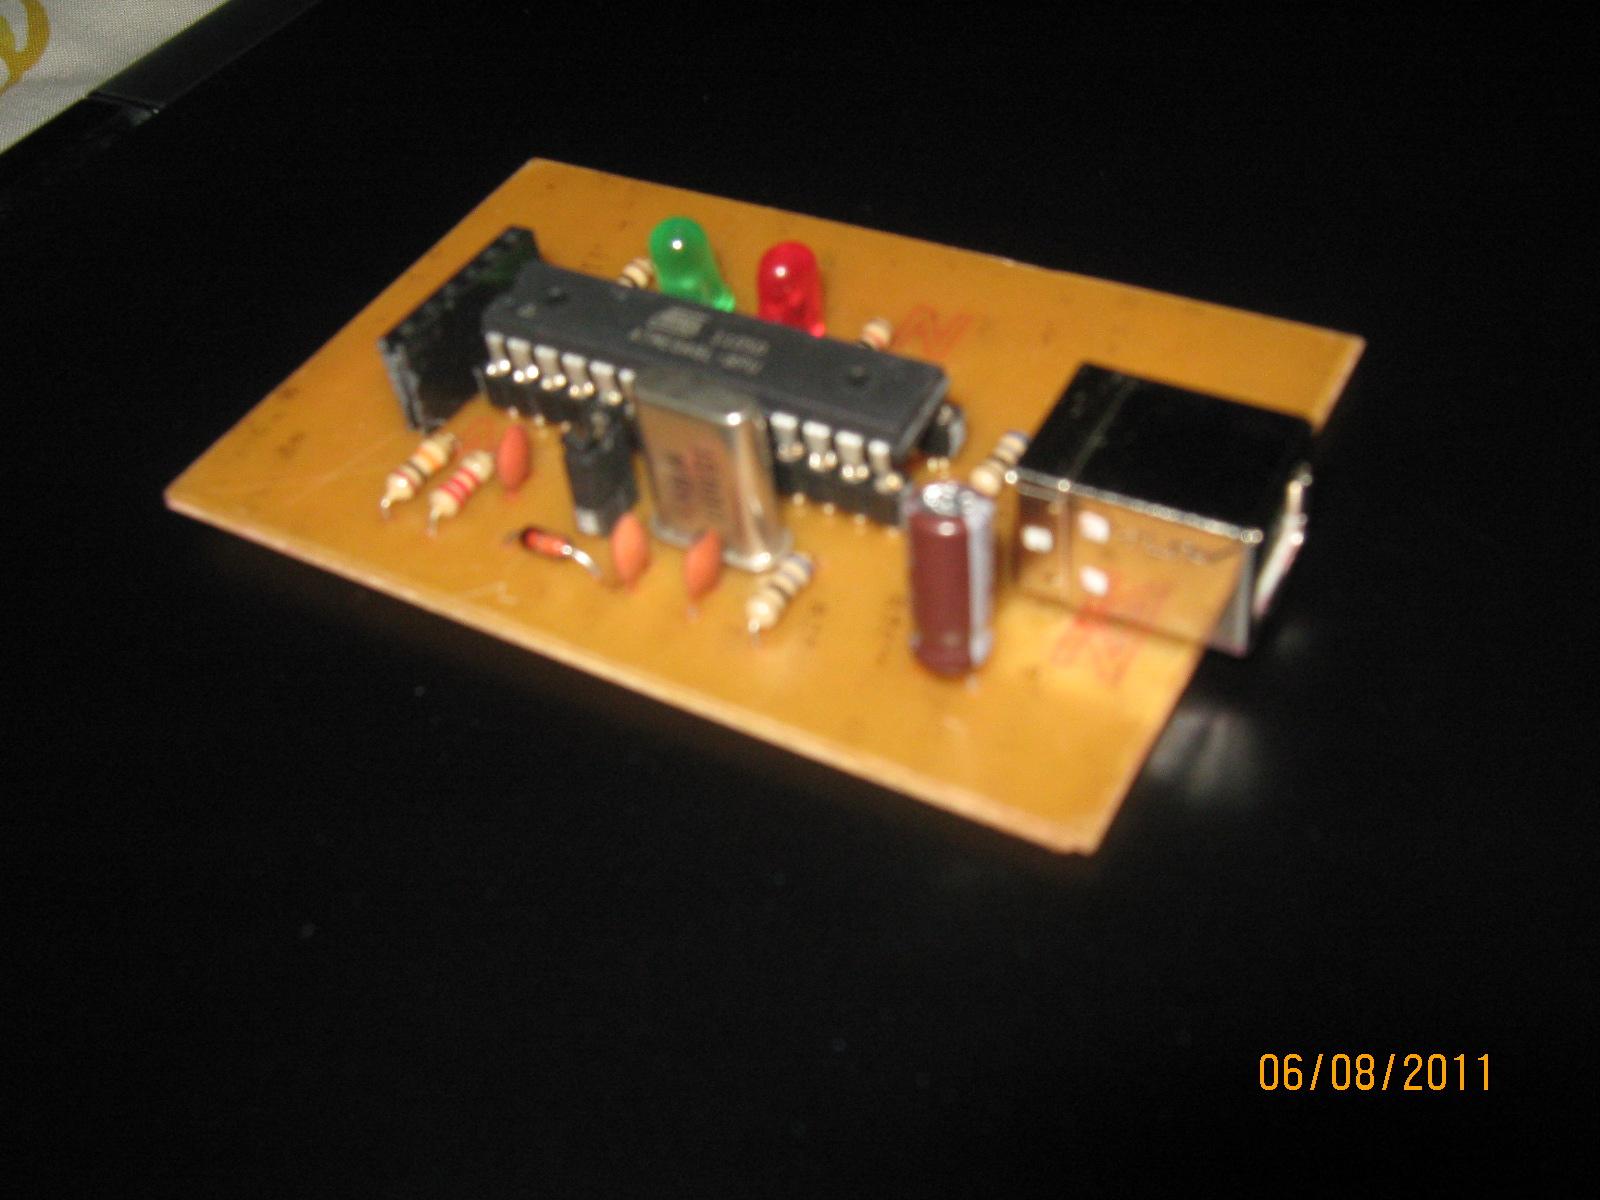 Atmel Avr Programmer Usbasp Modified Simplified Pcb Rabiuls Isp Circuit Schematic